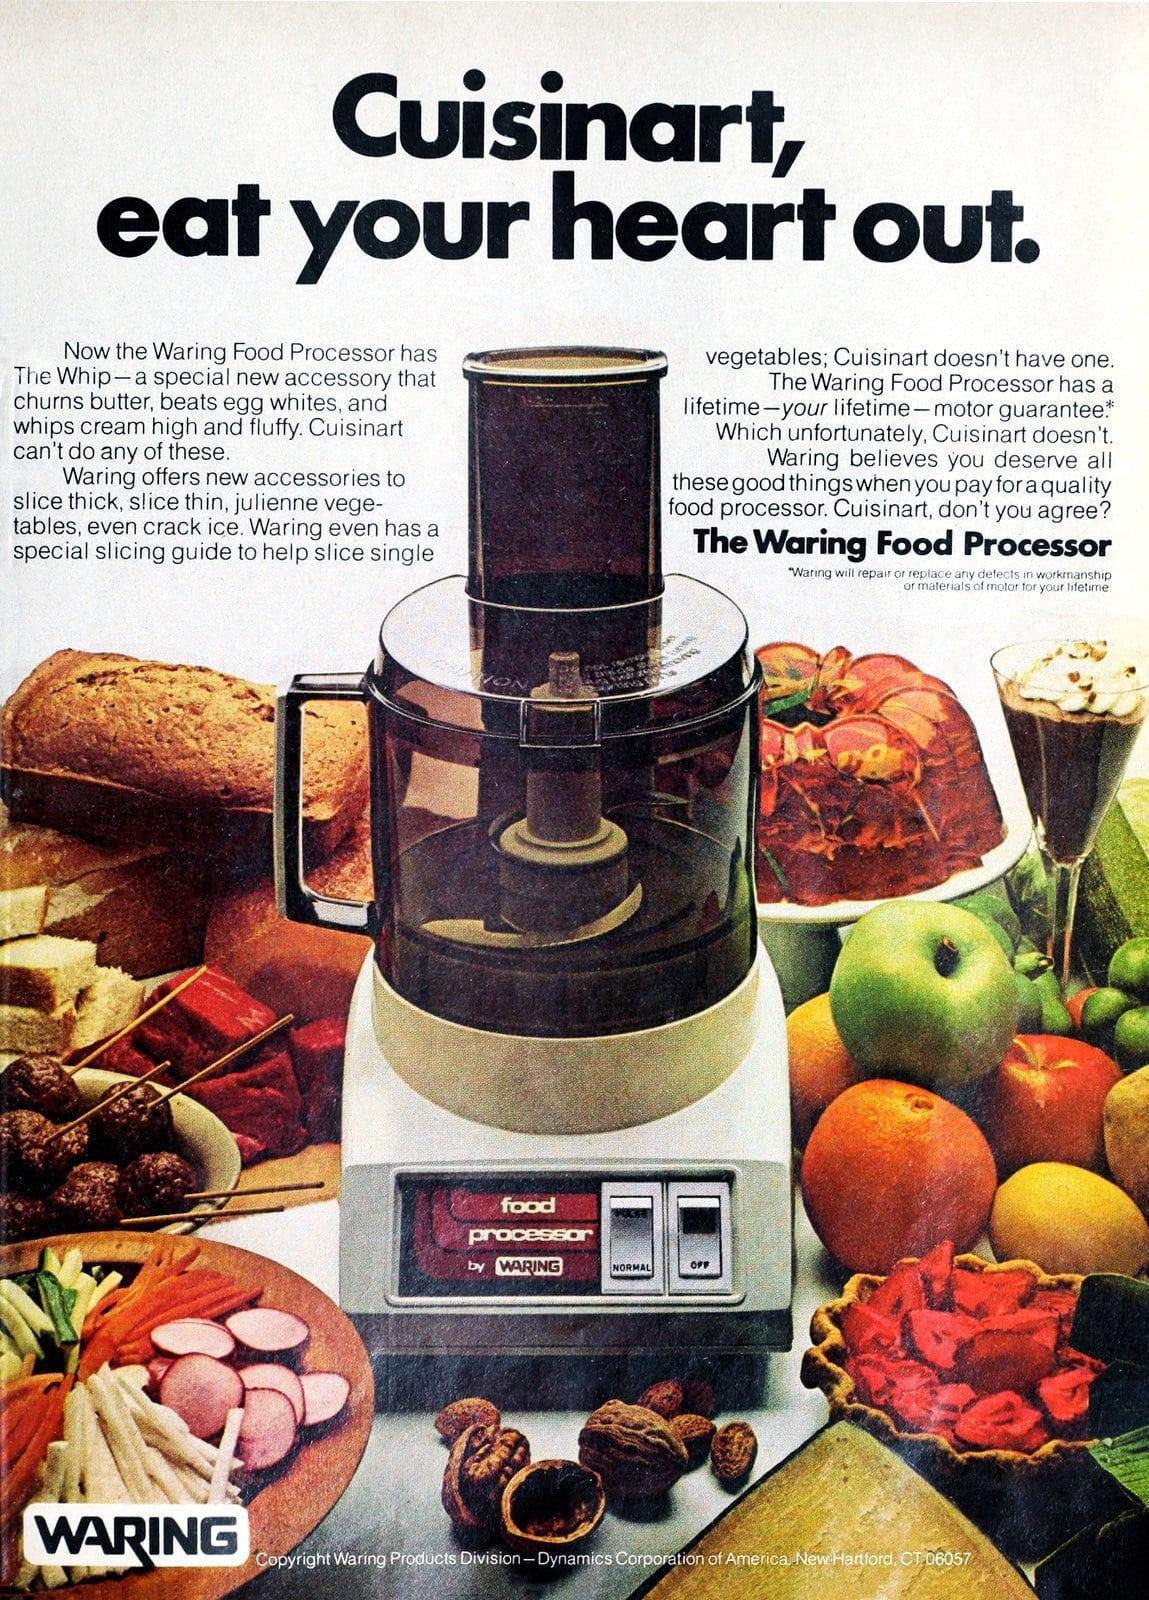 Retro Waring food processor (1978)